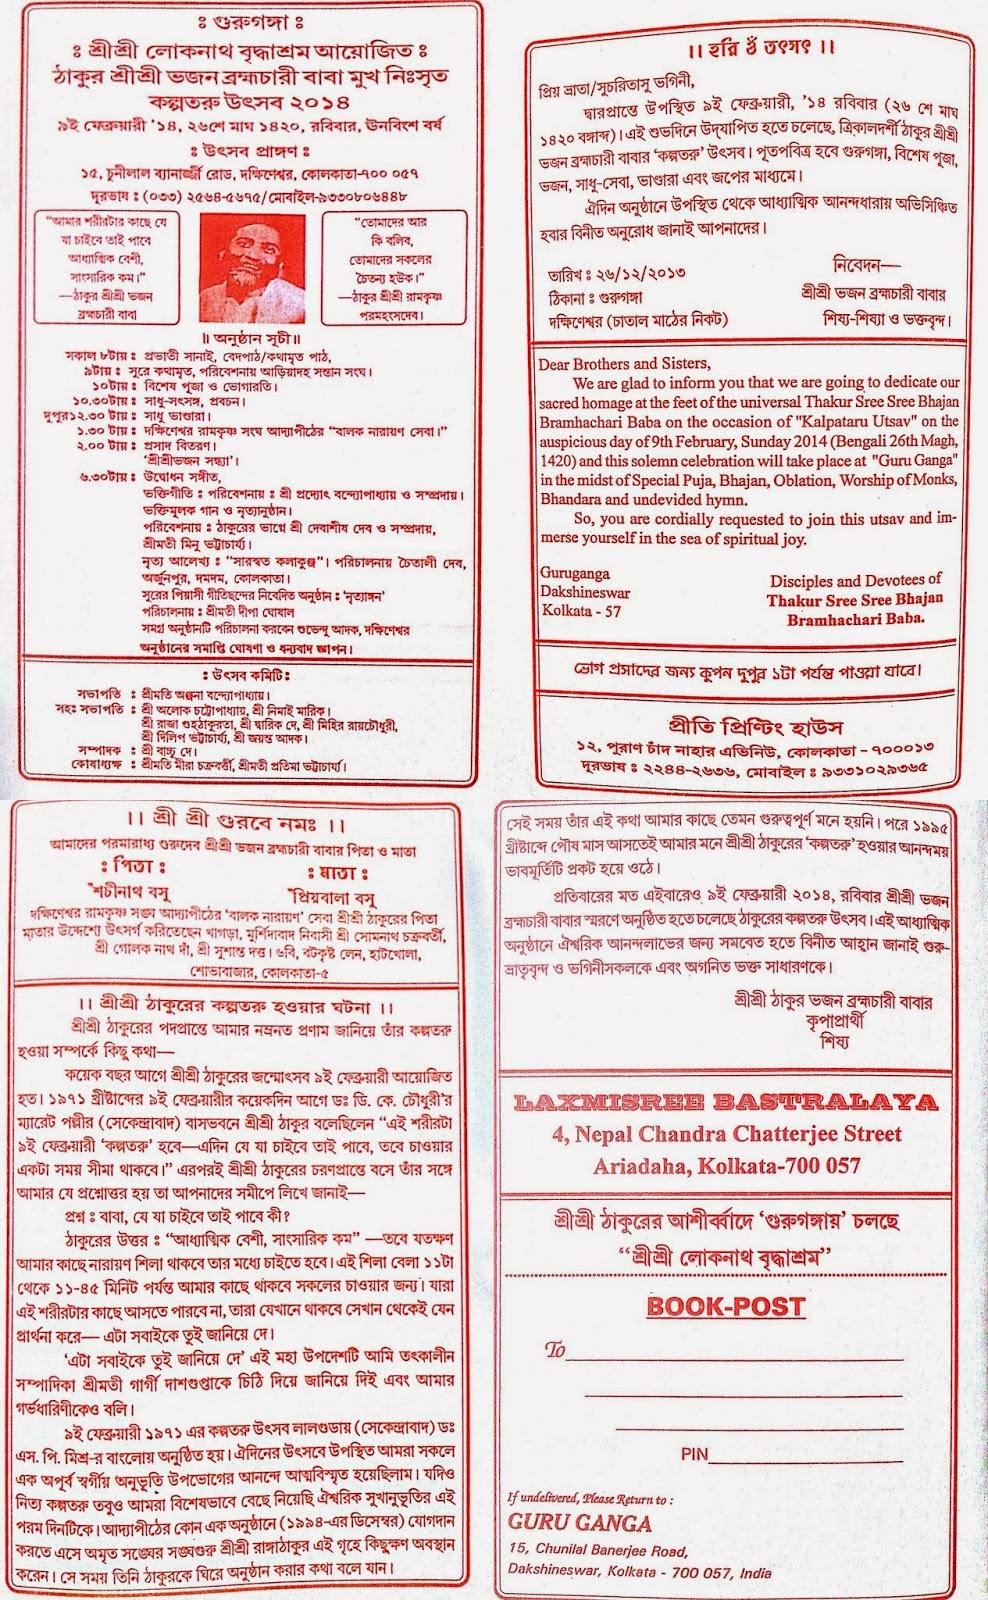 Kalpataru Invitation card